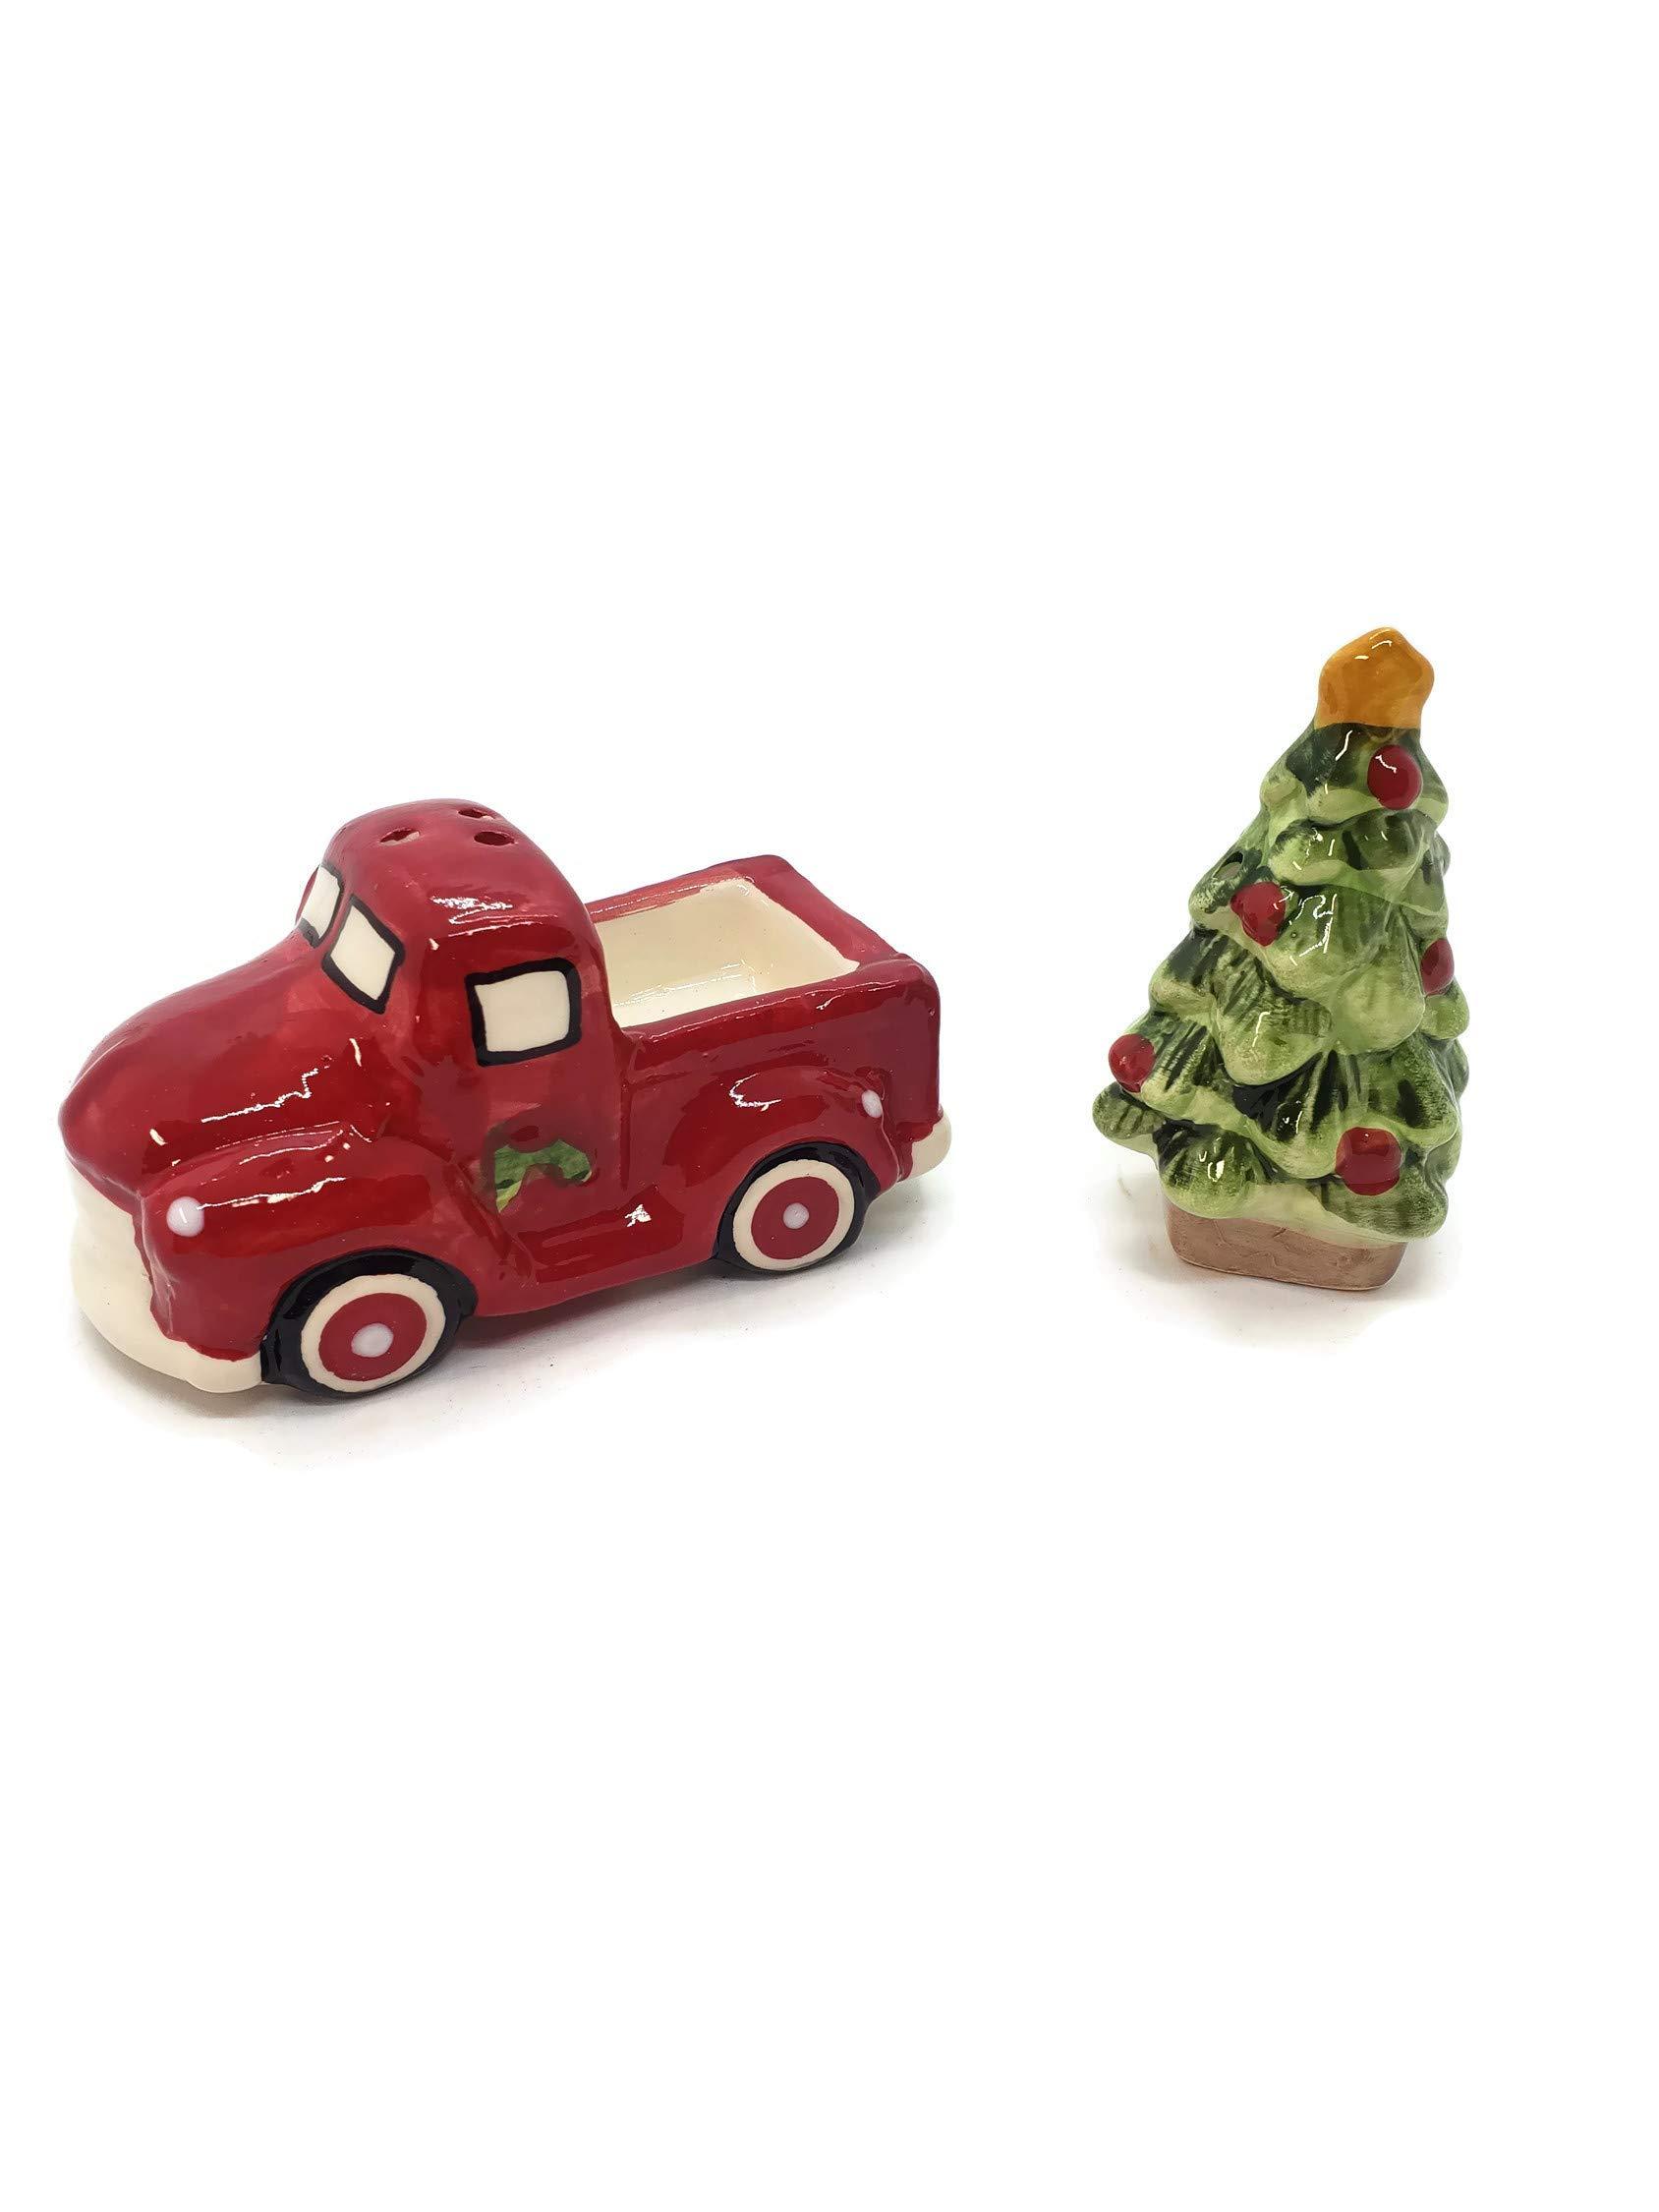 Hanna's Handiworks Christmas Tree Red Farm Truck Salt & Pepper Set - Christmas Red Farm Truck Decorations